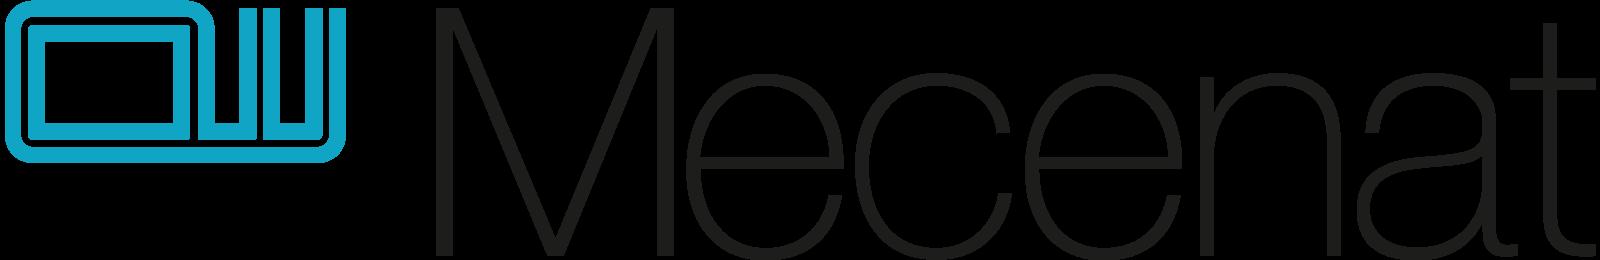 Mecenat-logo-rgb_1600x268